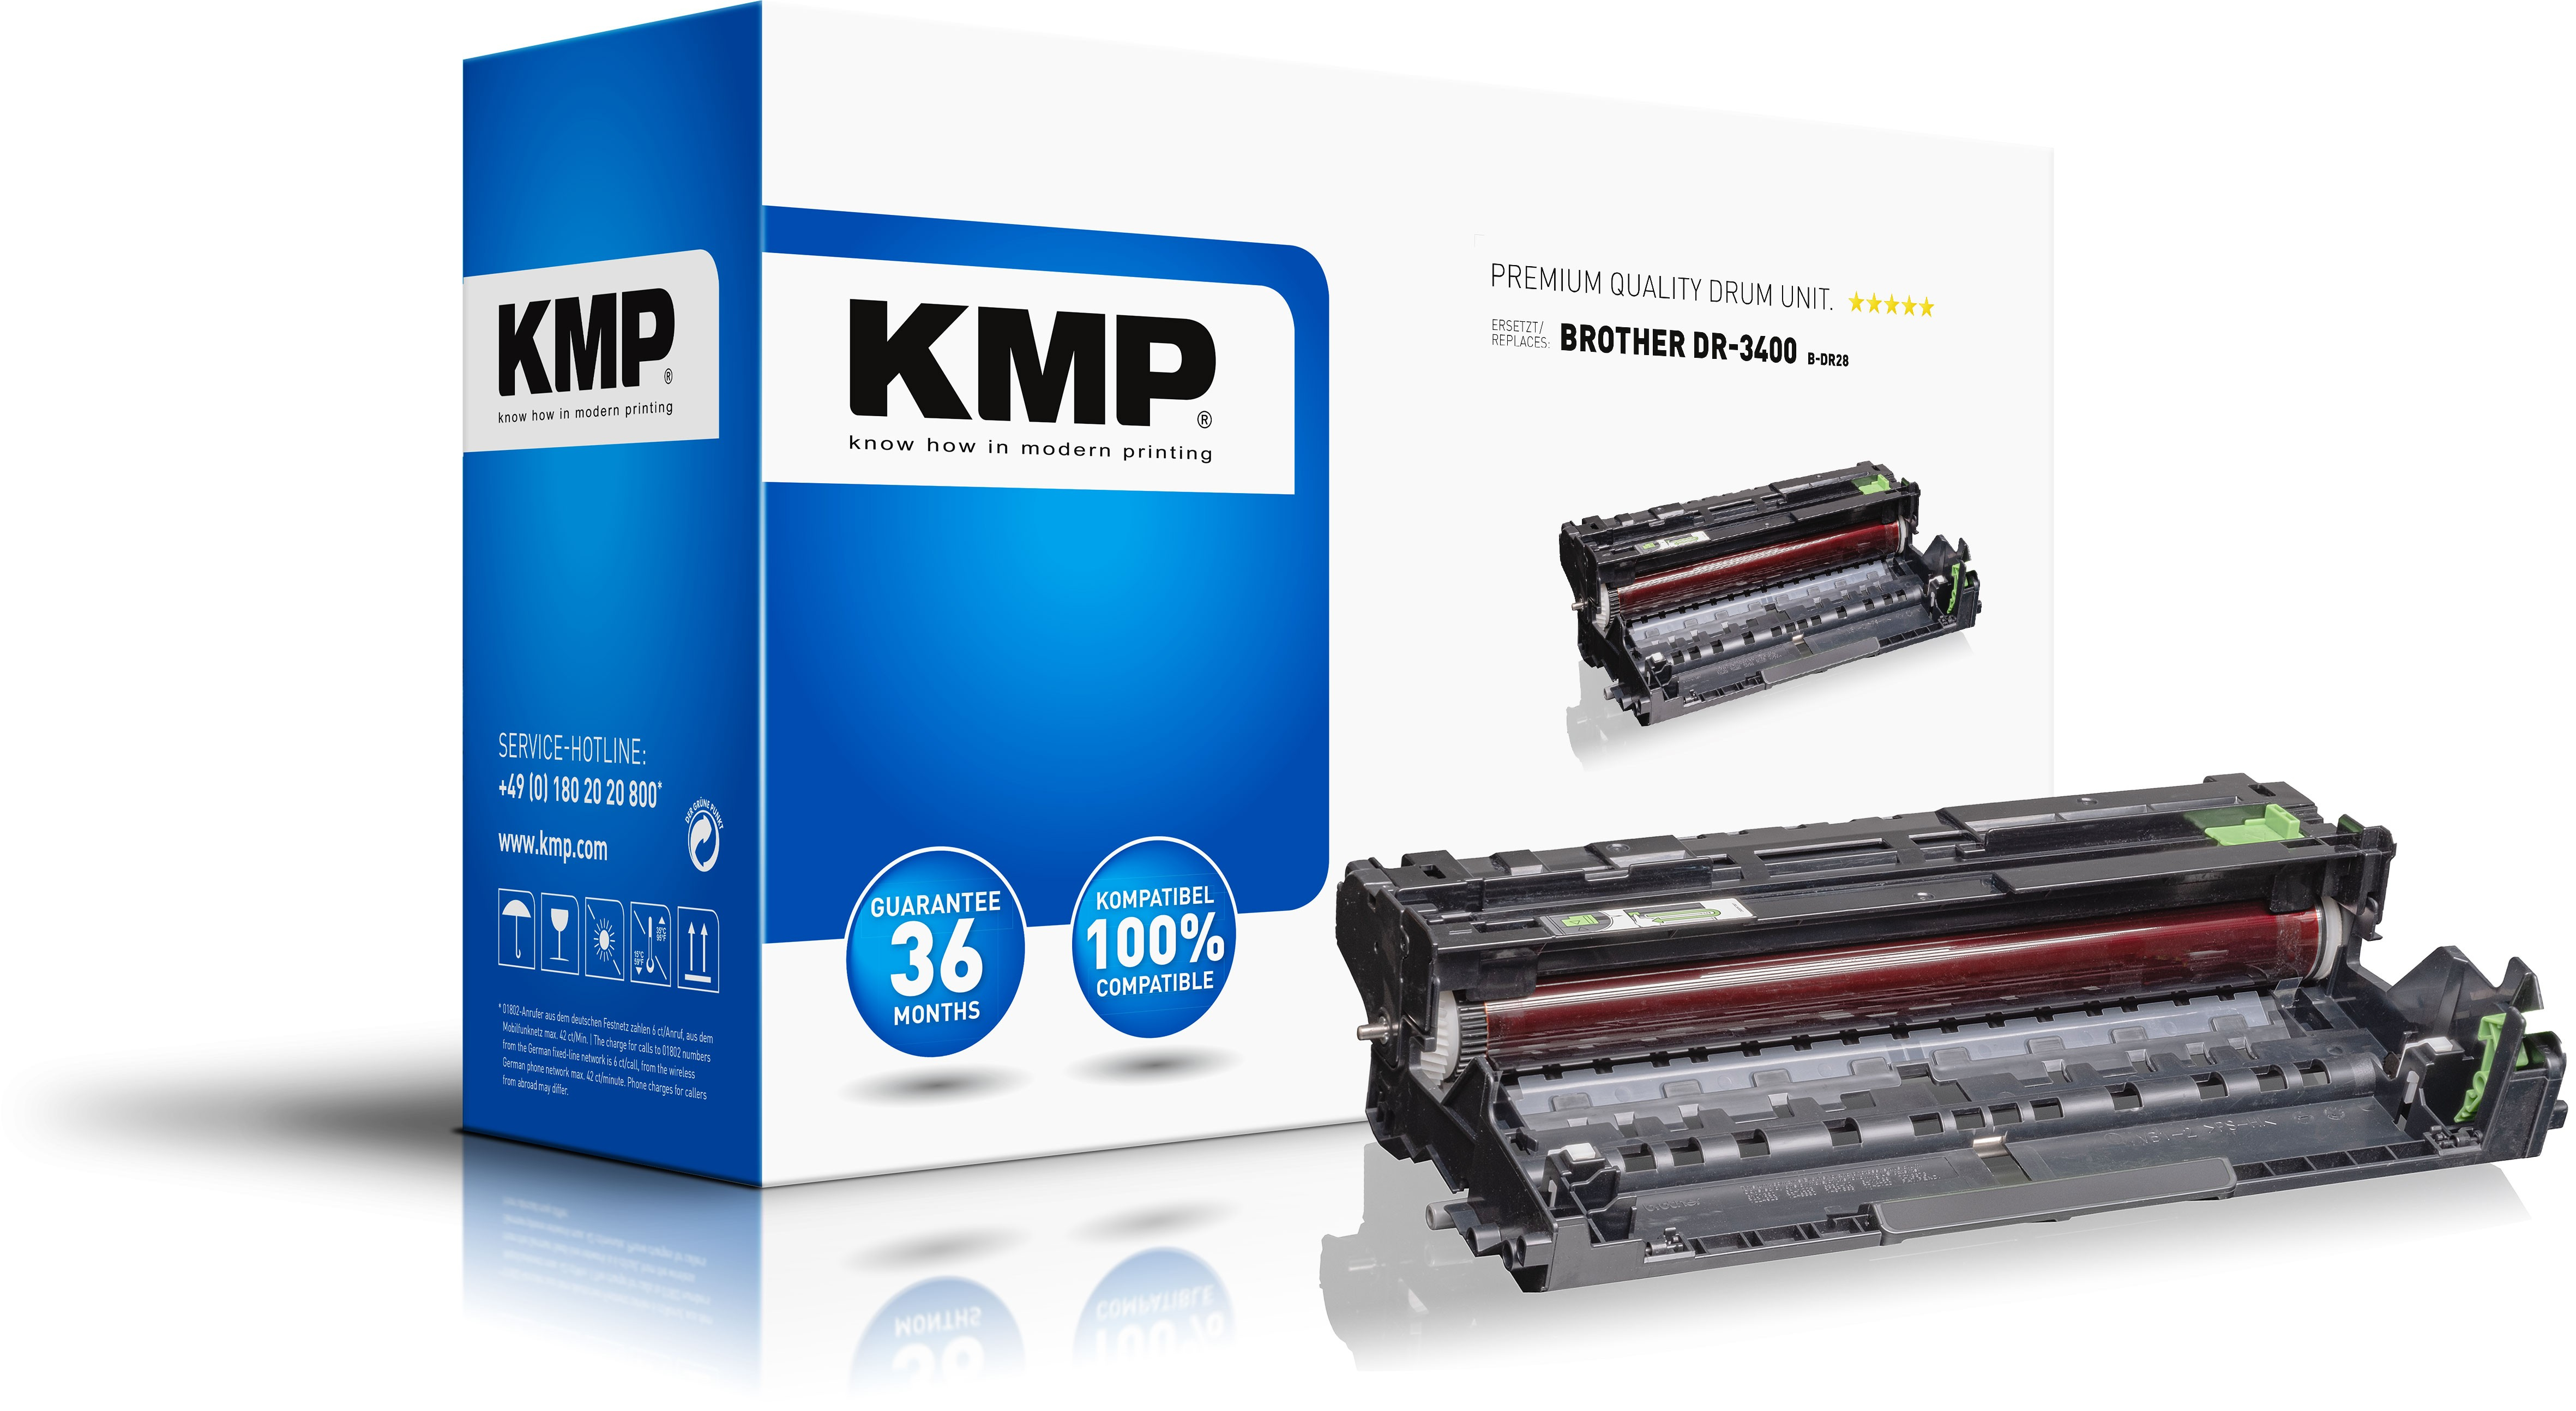 KMP B-DR28 - Kompatibel - Brother - DCP-L5500DN/DCP-L6600DW - HL-L5000D/HL-L5100DN/HL-L5100DNT/ HL-L5100DNTT/HL-L5200DW/HL-L6250DN/... - 1 Stück(e) - 52000 Seiten - Laserdrucken